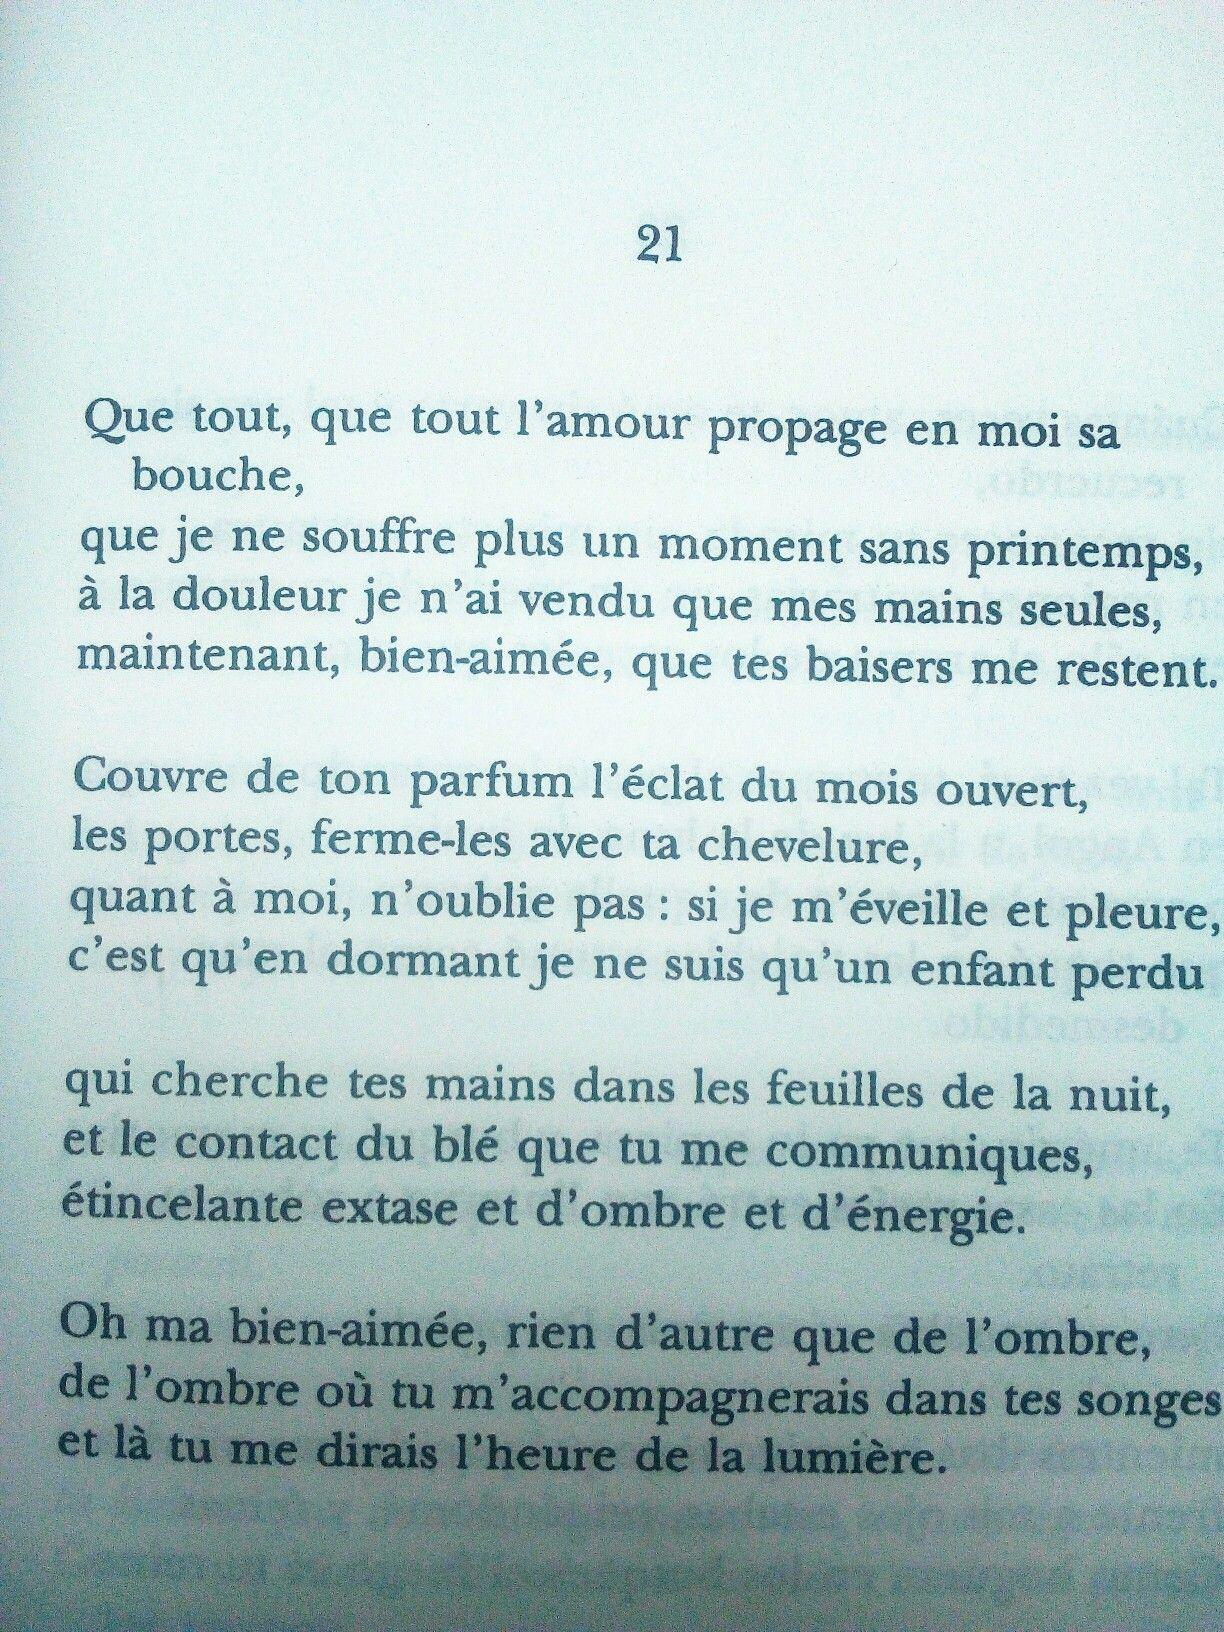 Pablo Neruda La Centaine Damour Poeme Et Citation